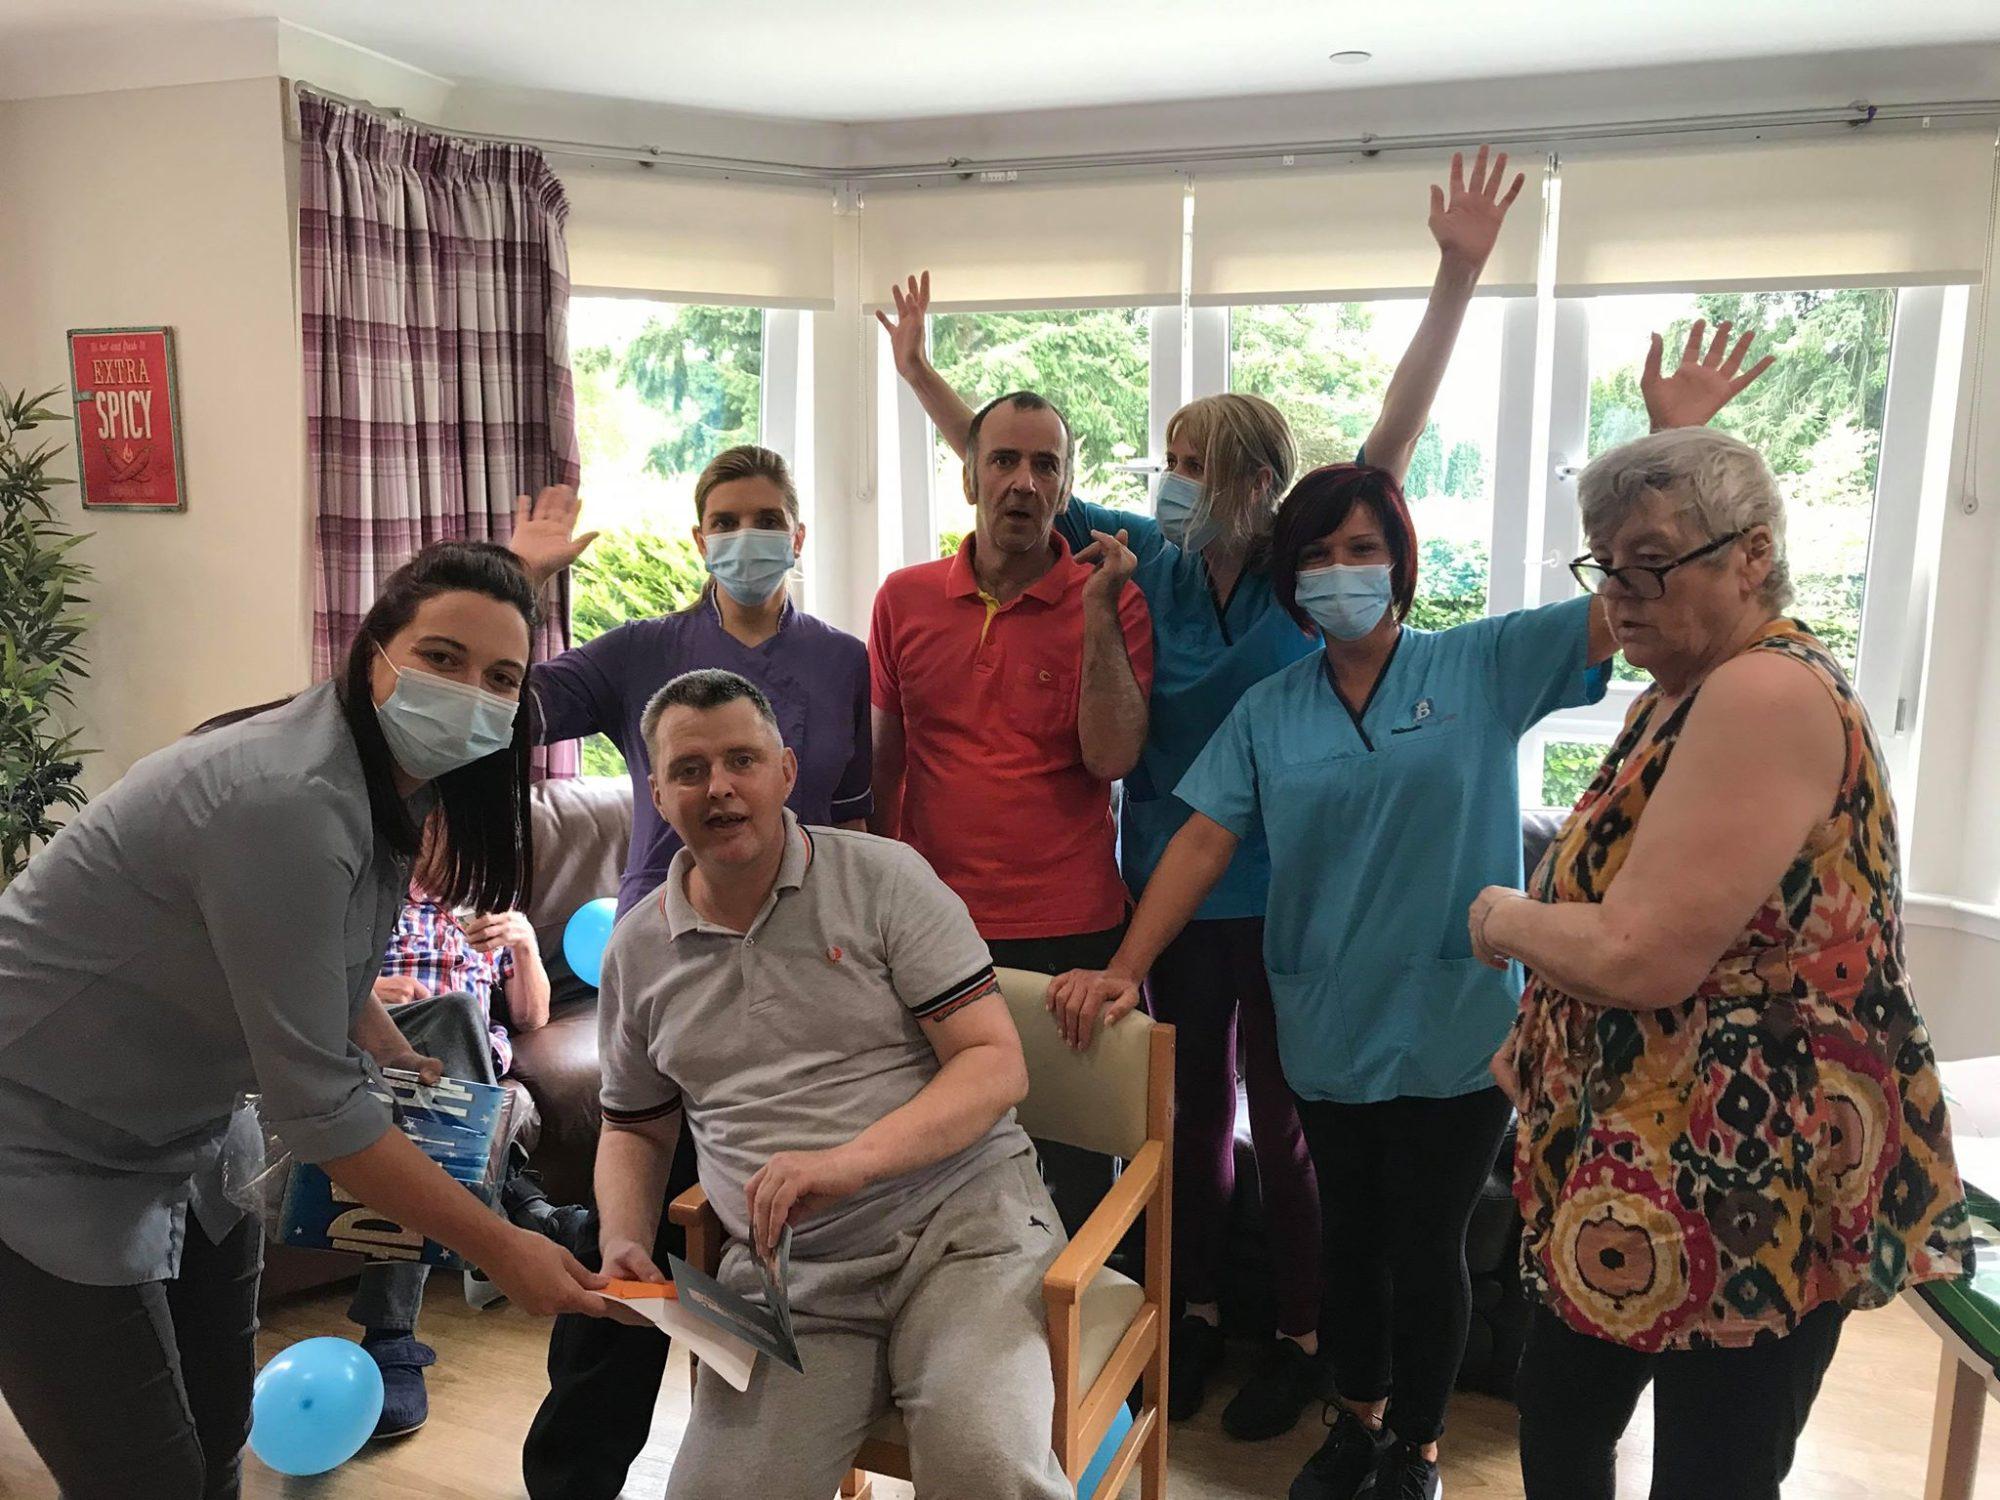 Rumbling Bridge throw a party for service user Gavin's birthday